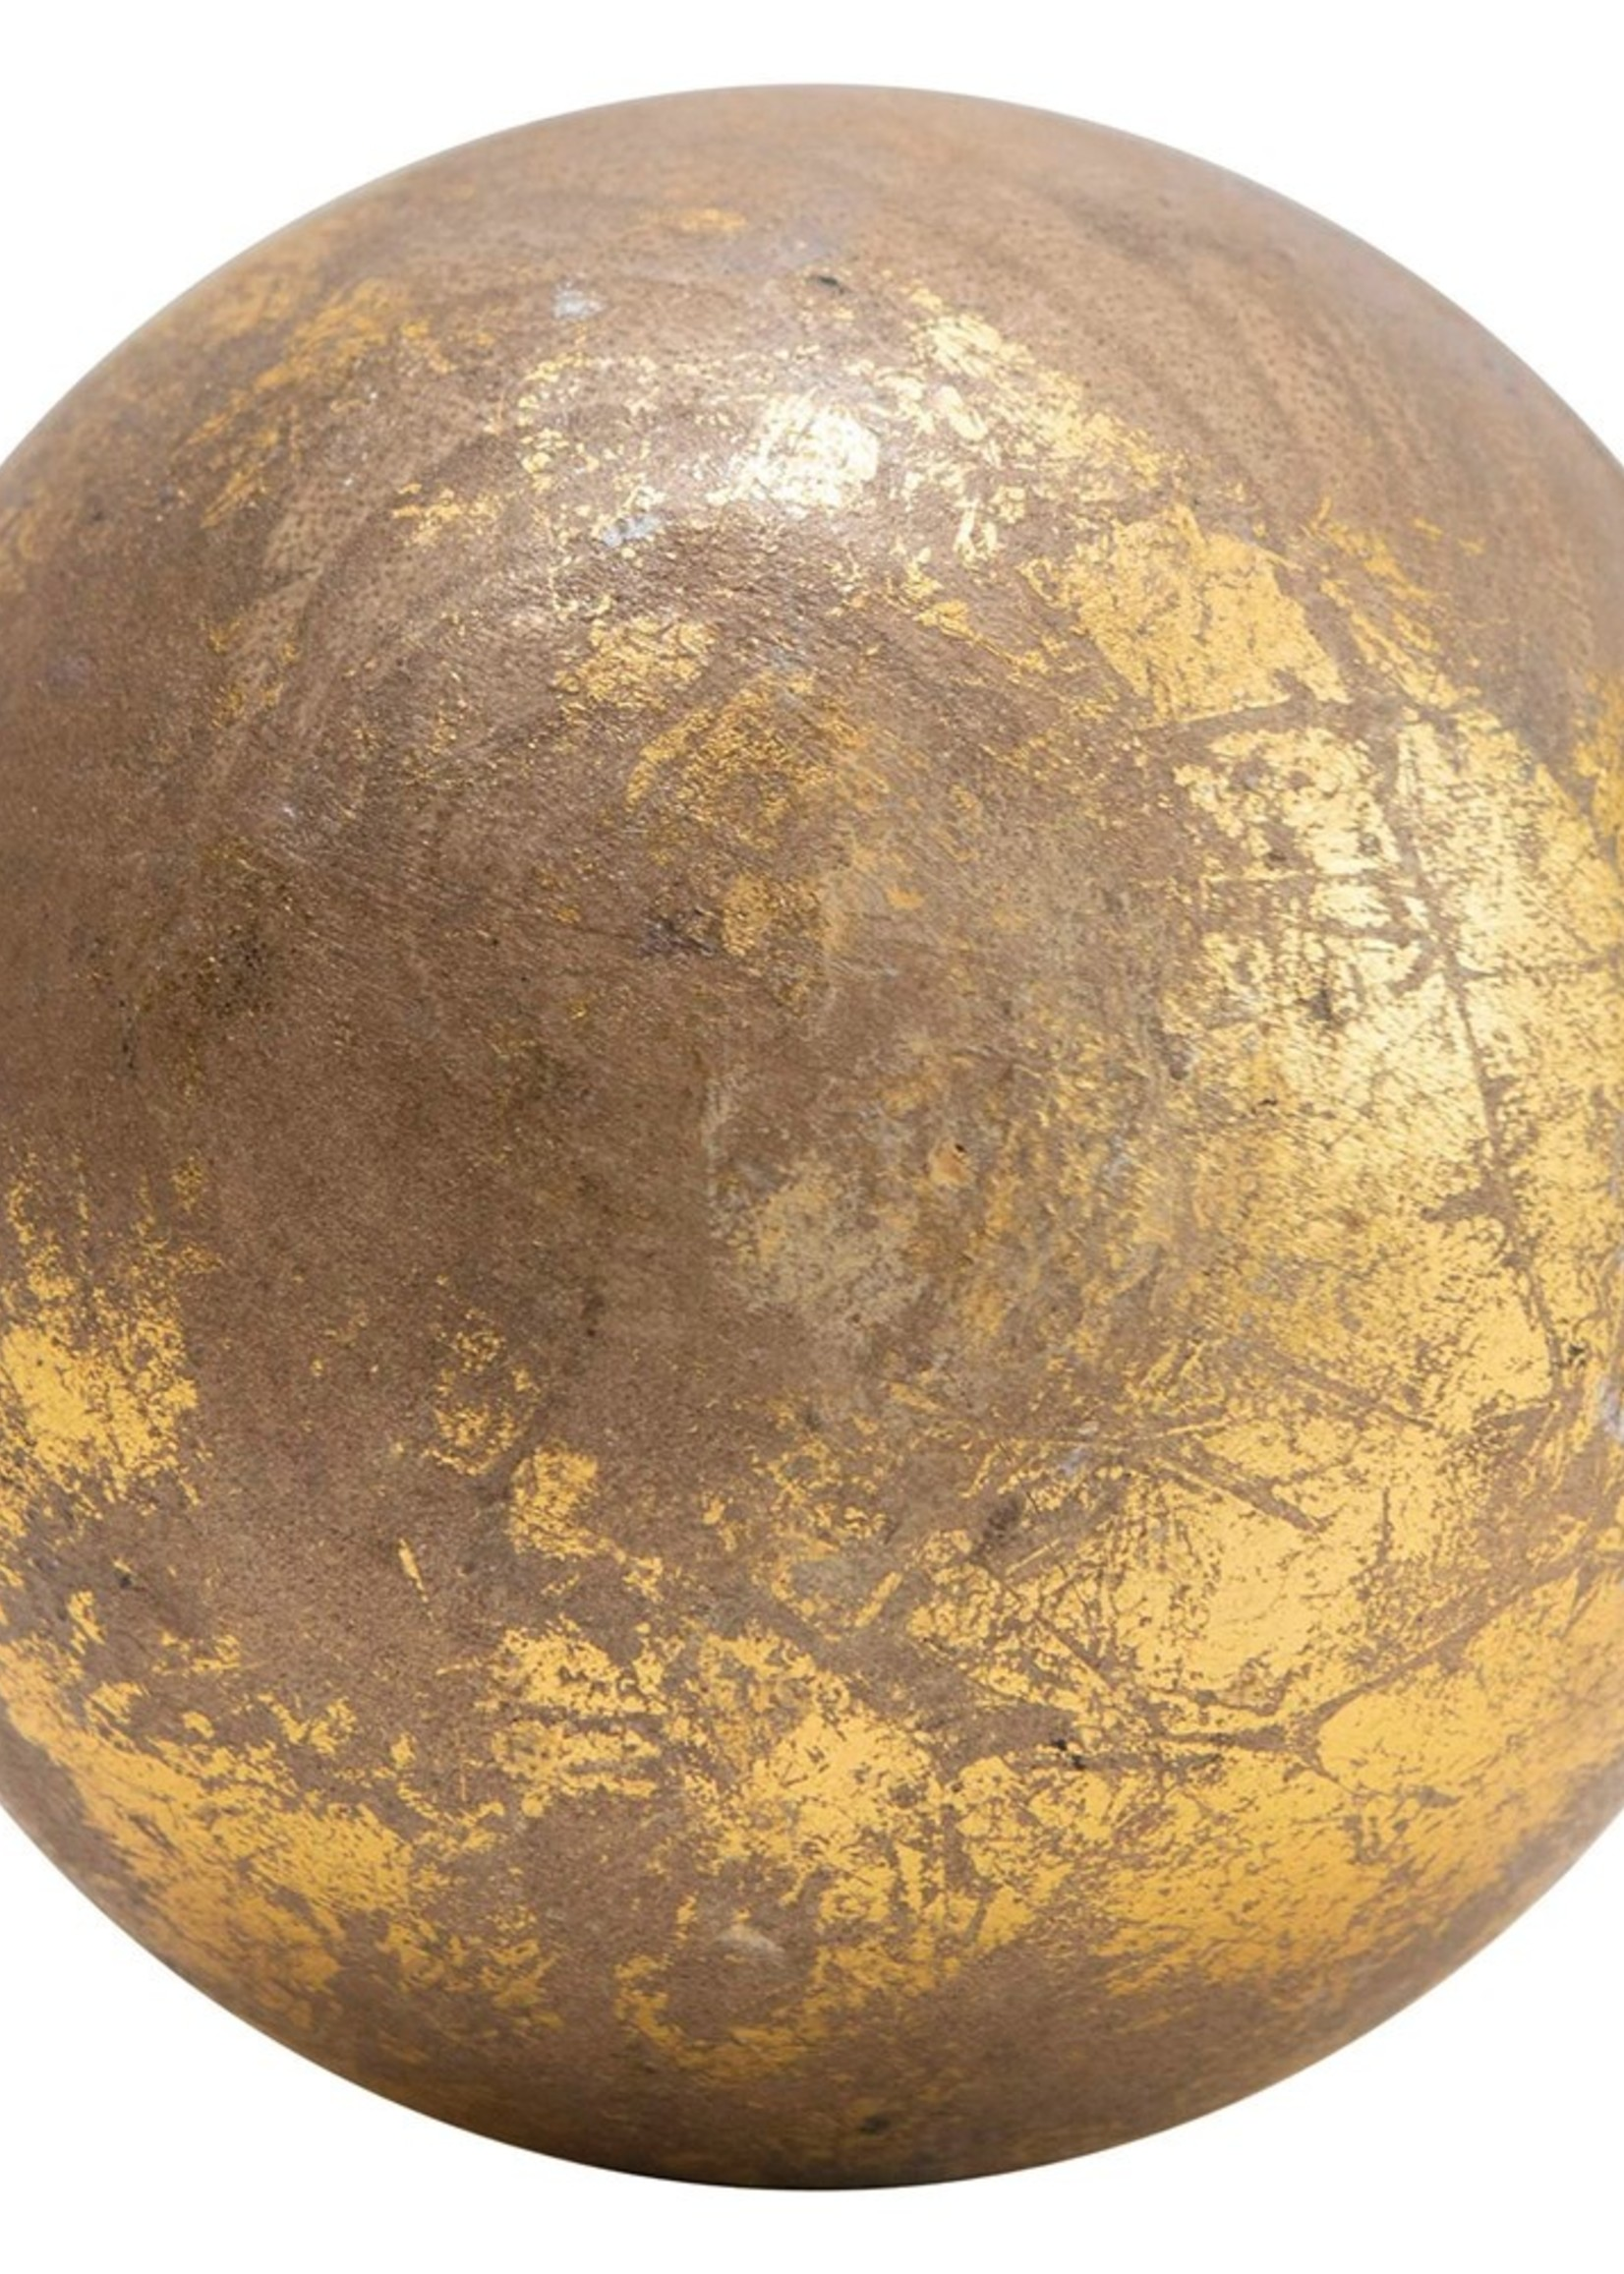 Round Mango Wood Orb, Gold Foil Finish